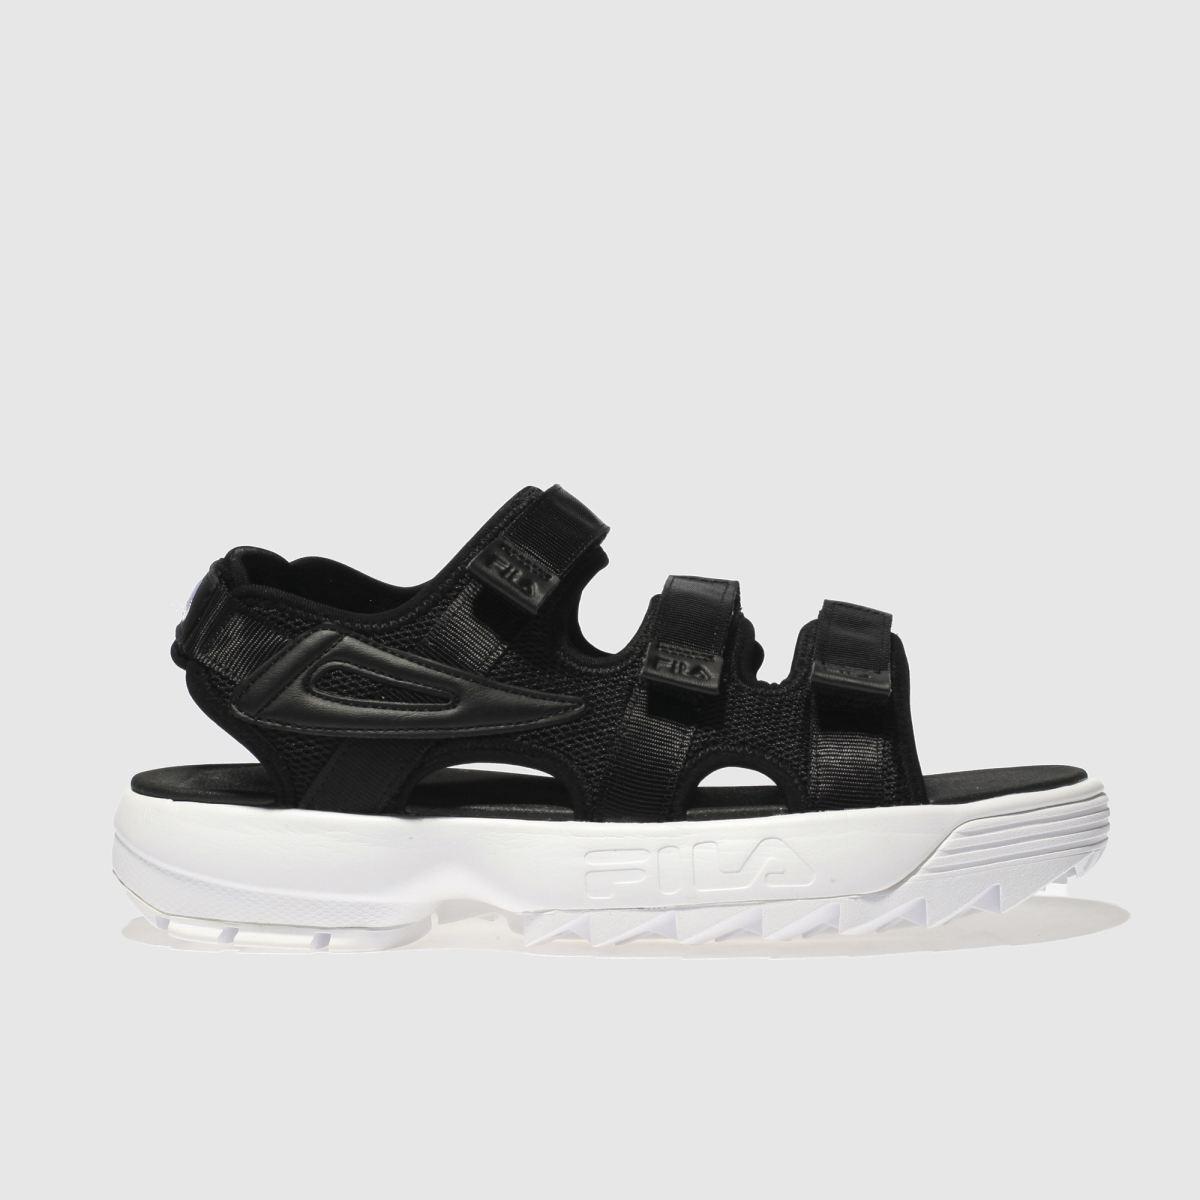 Fila Fila Black & White Disruptor Sandals